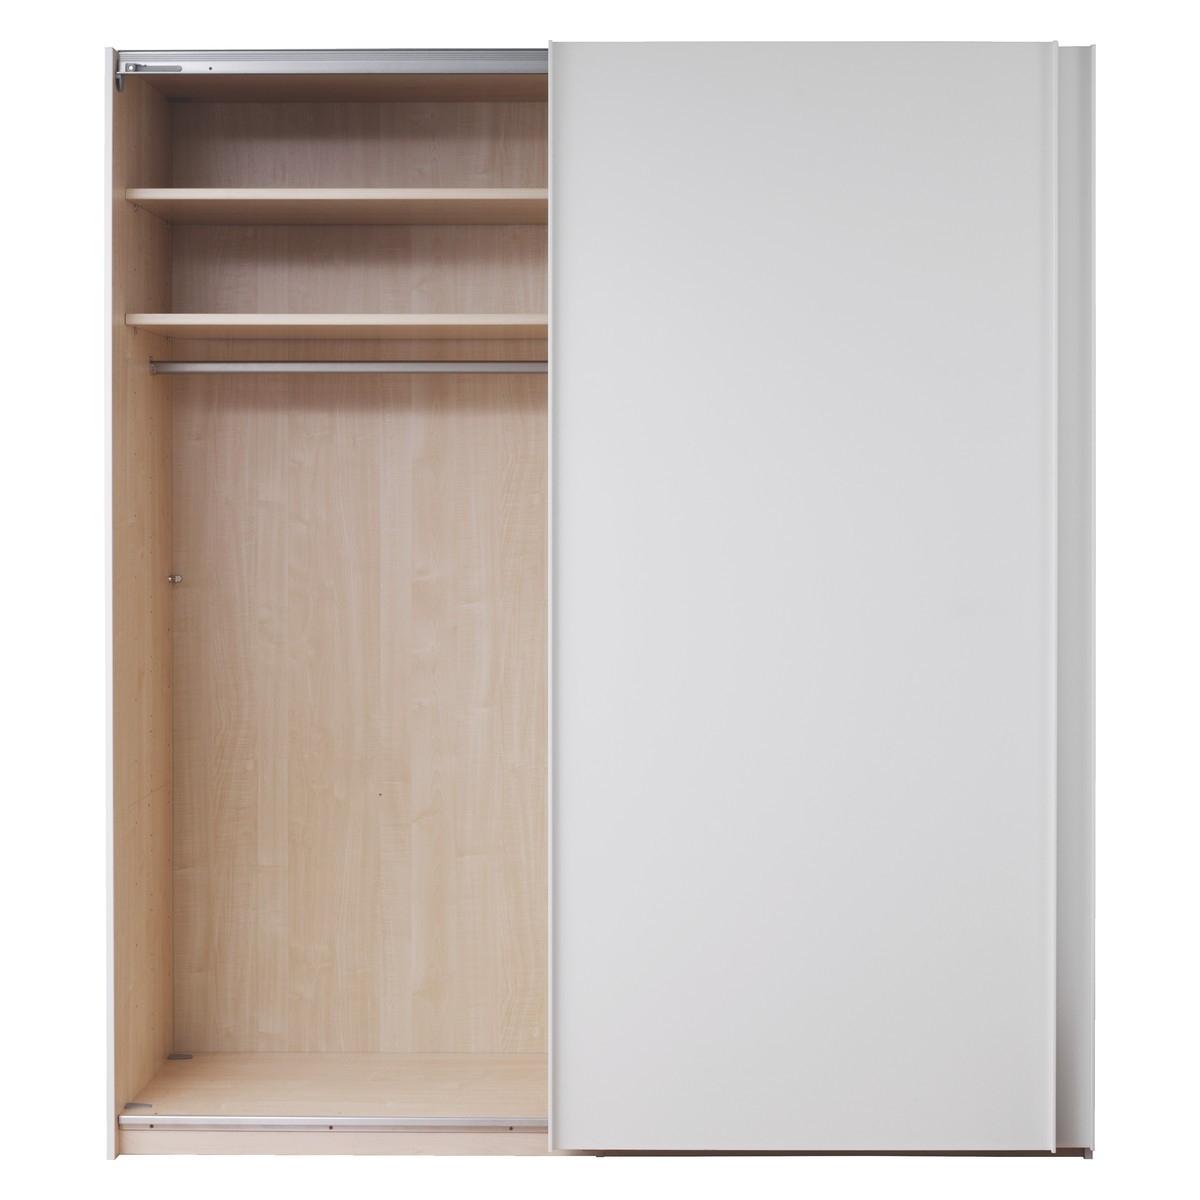 Single White Wardrobes Regarding Preferred Kripton Matt White 2 Door Sliding Wardrobe W160 X H223Cm (View 11 of 15)